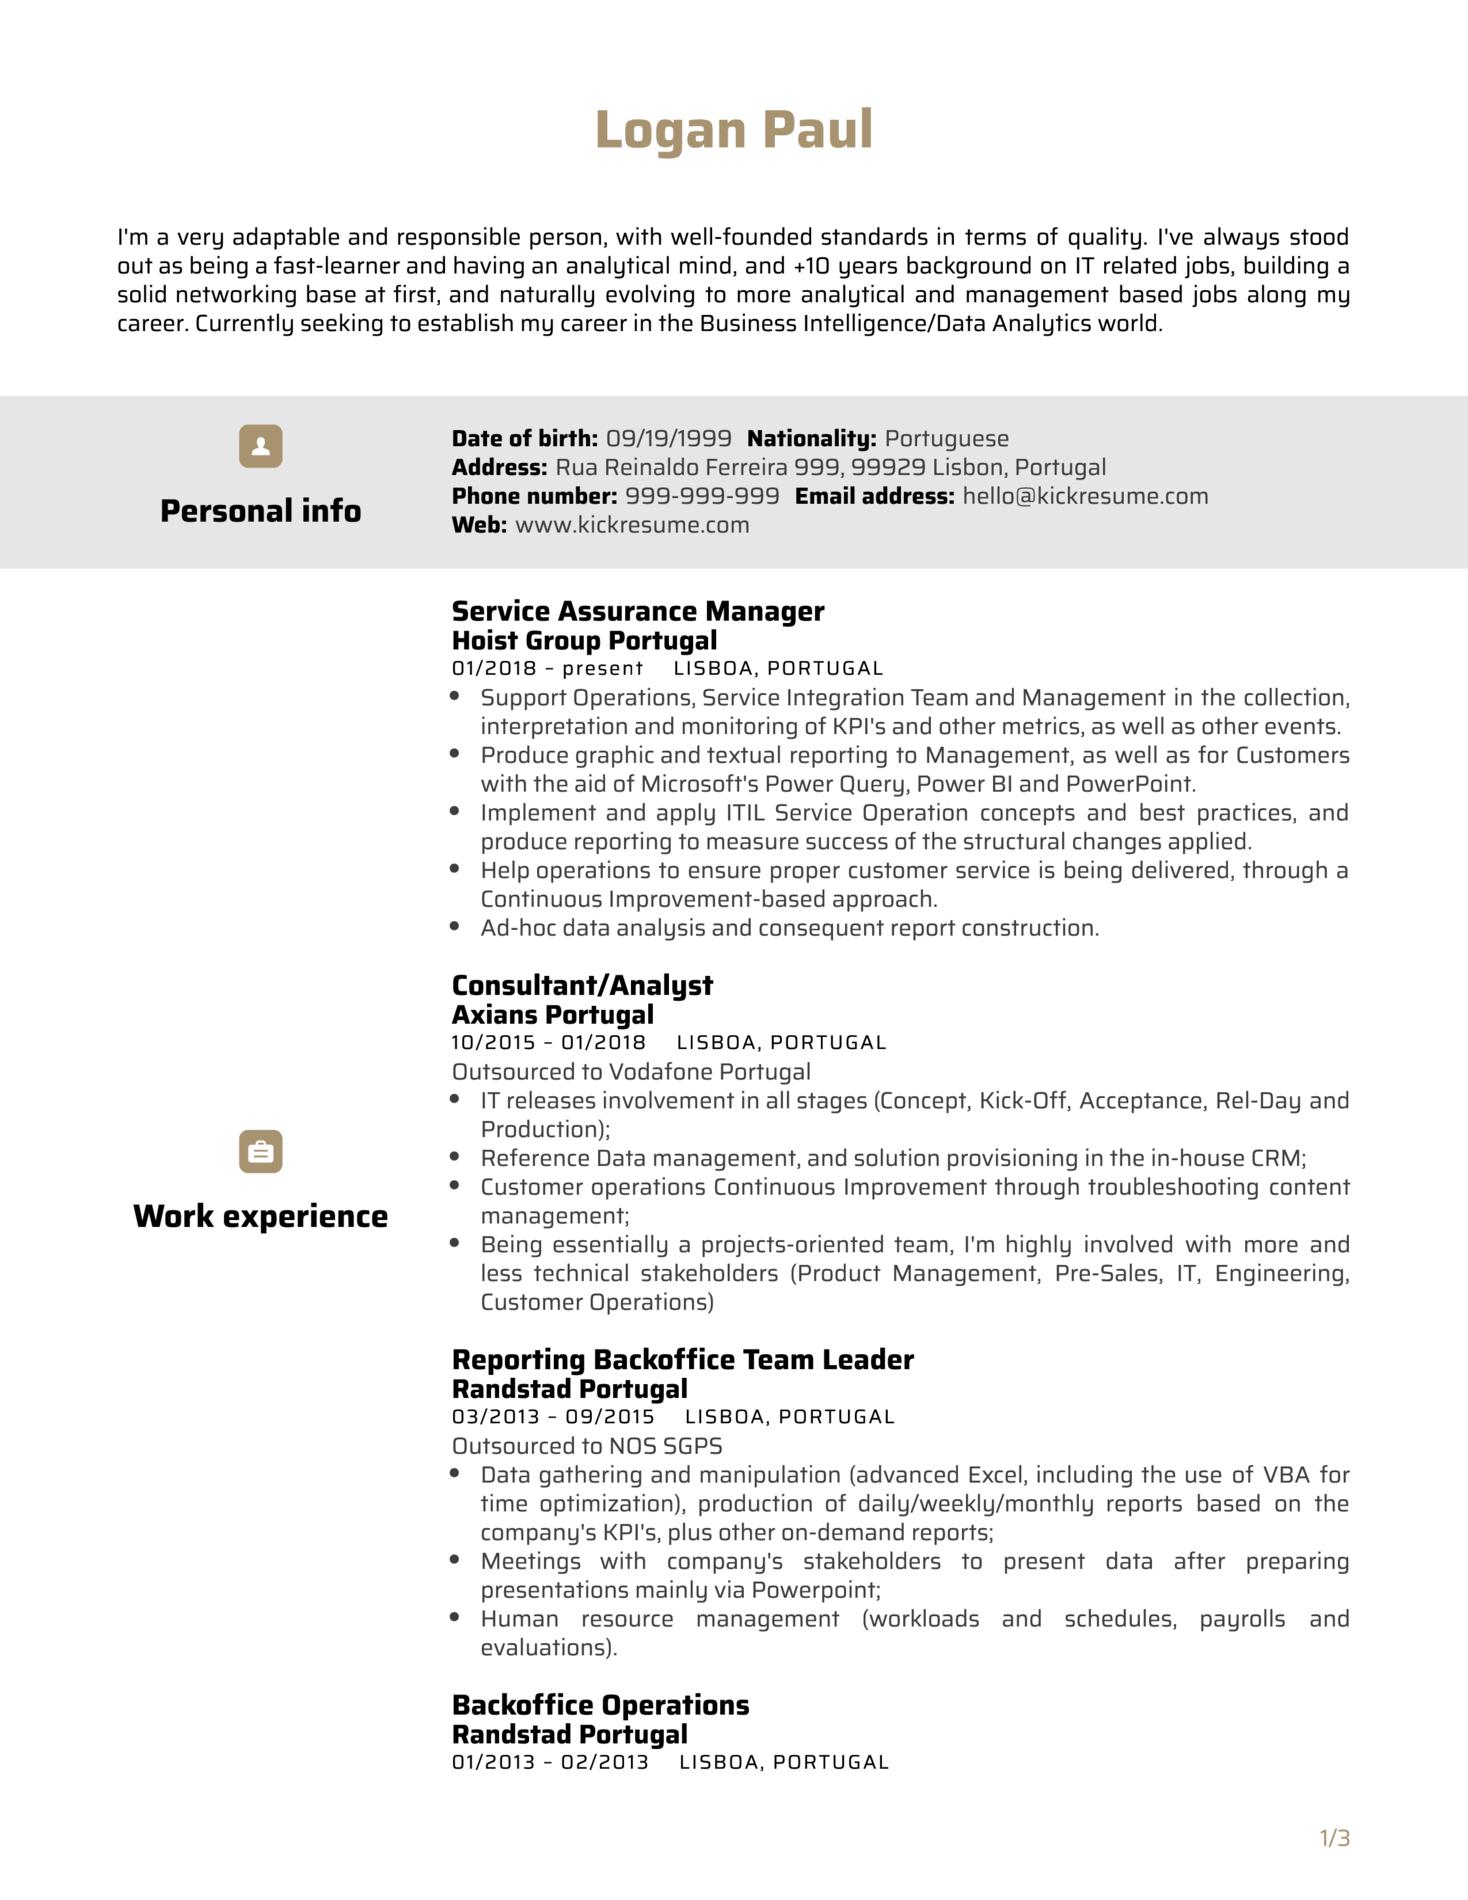 Data Service Manager Resume Sample (Part 1)